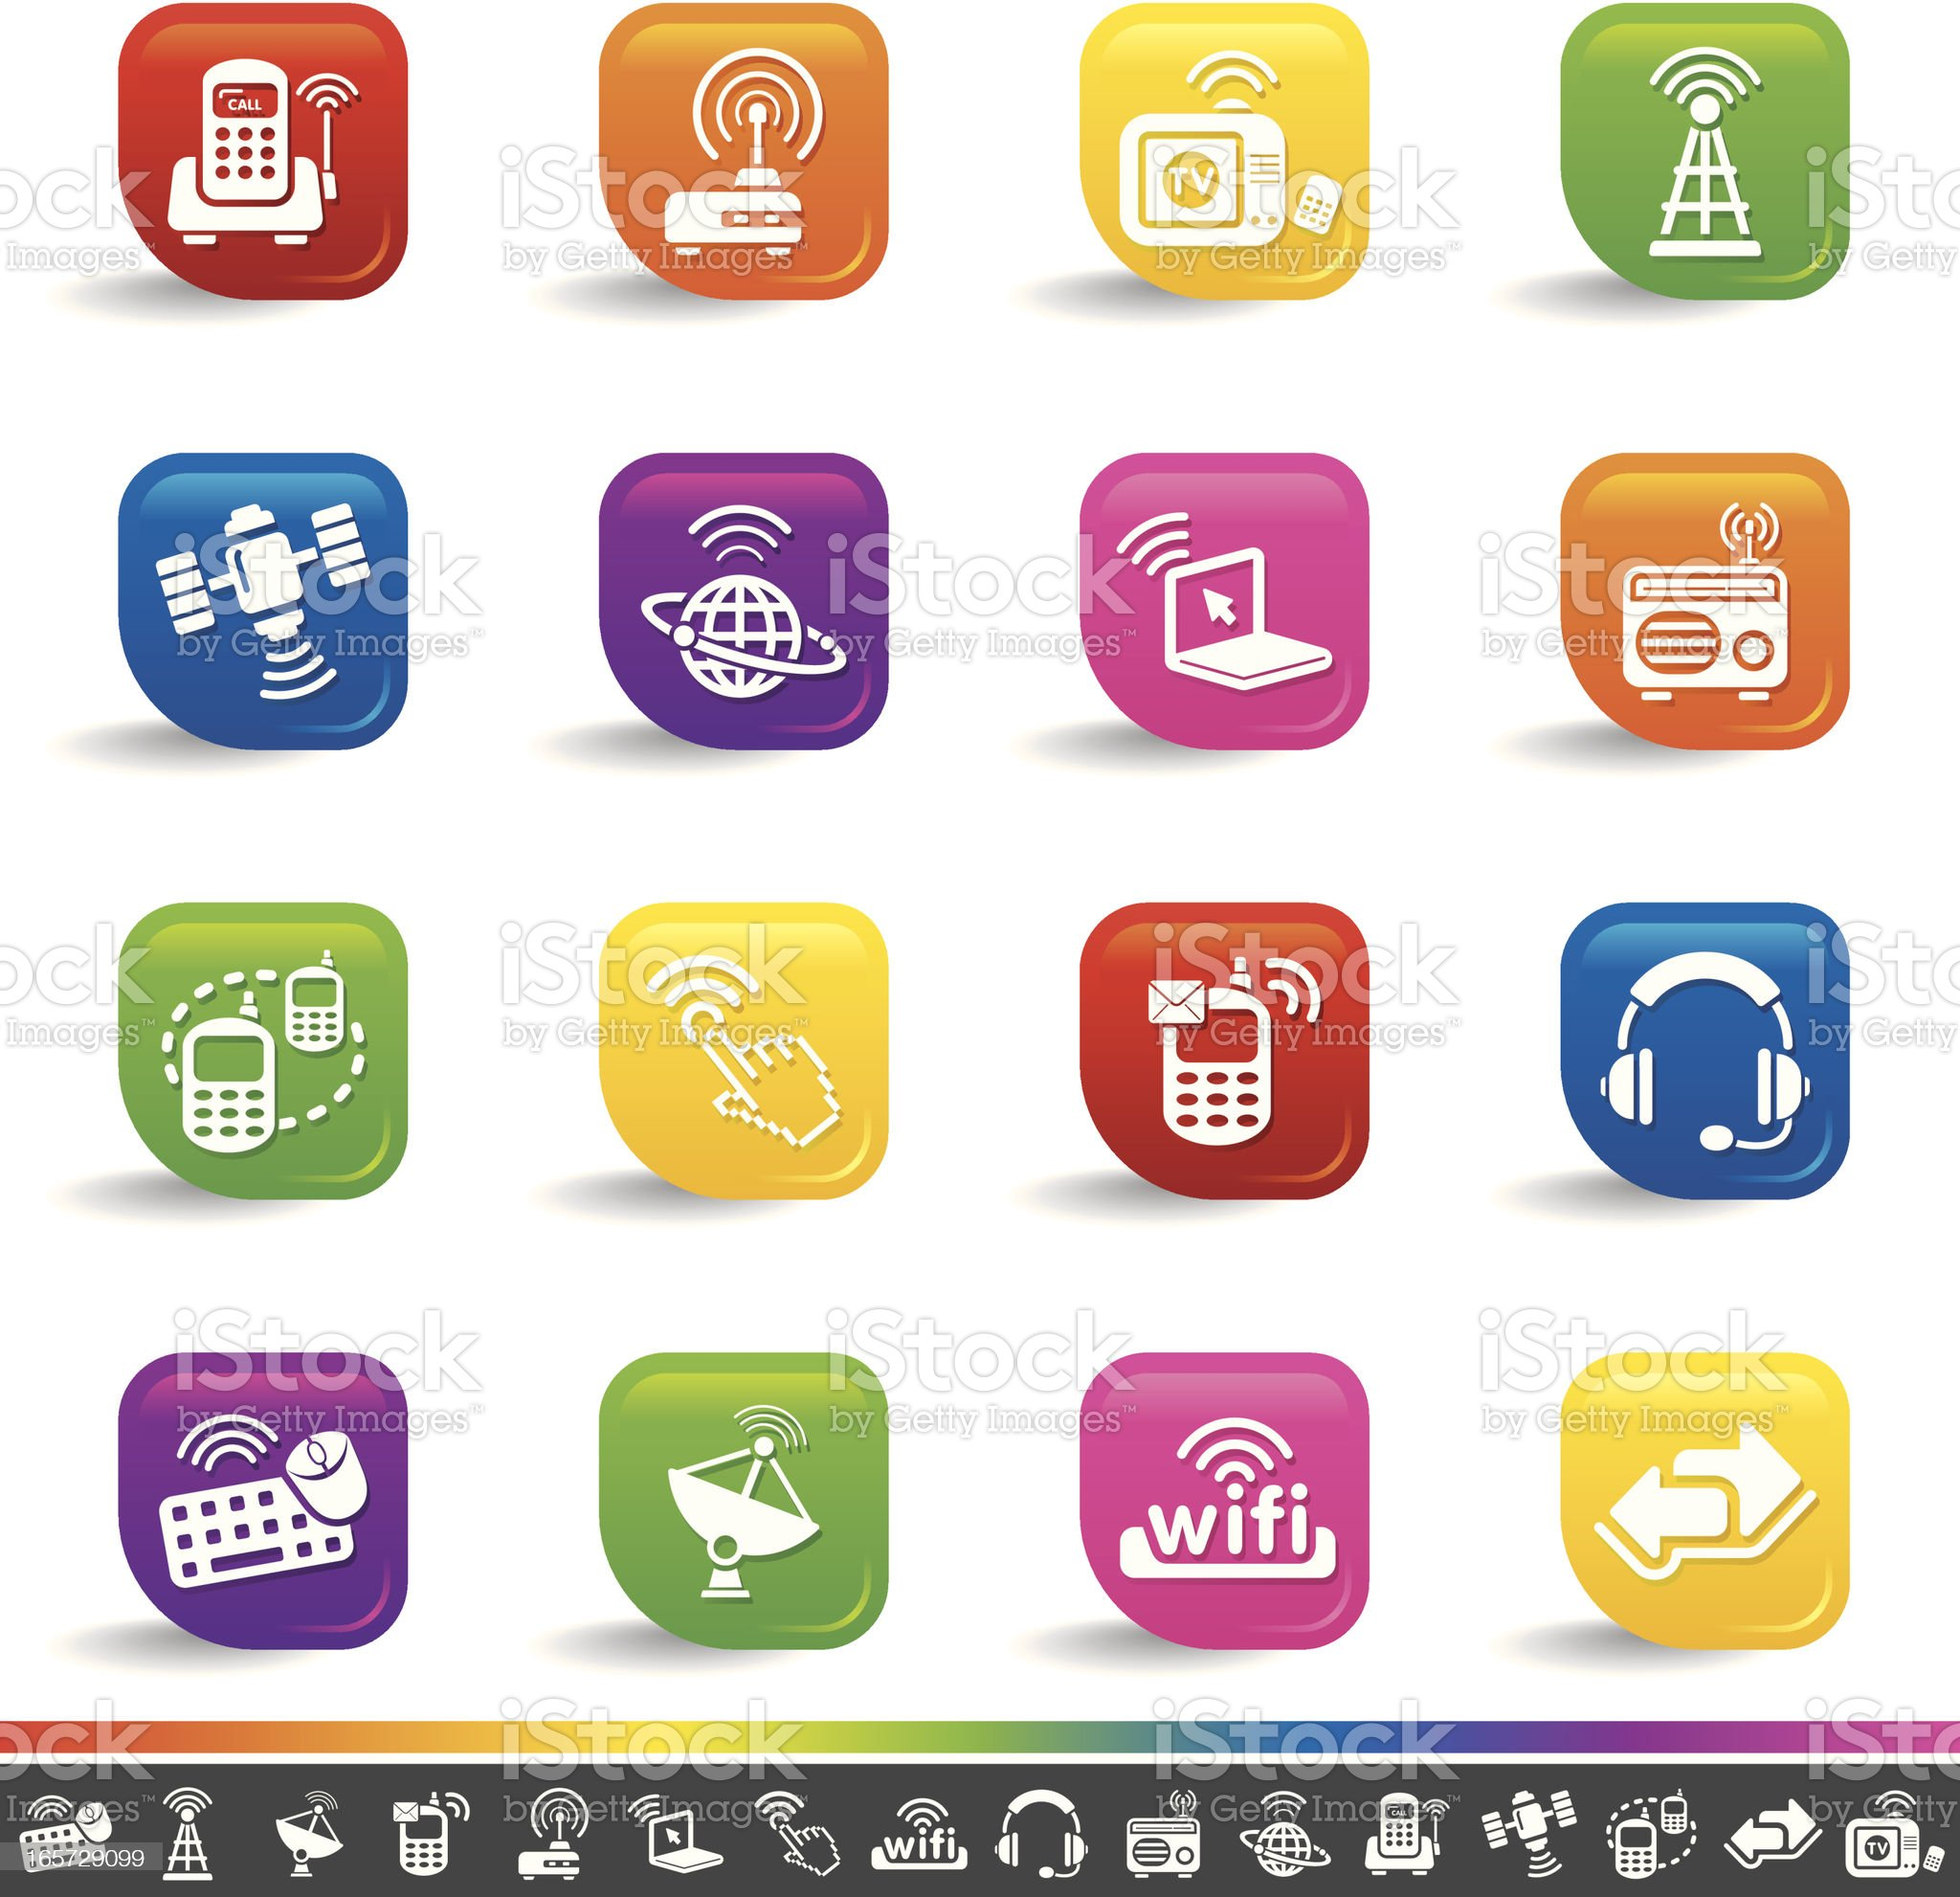 Wireless technology icons | Rainbow Series royalty-free stock vector art